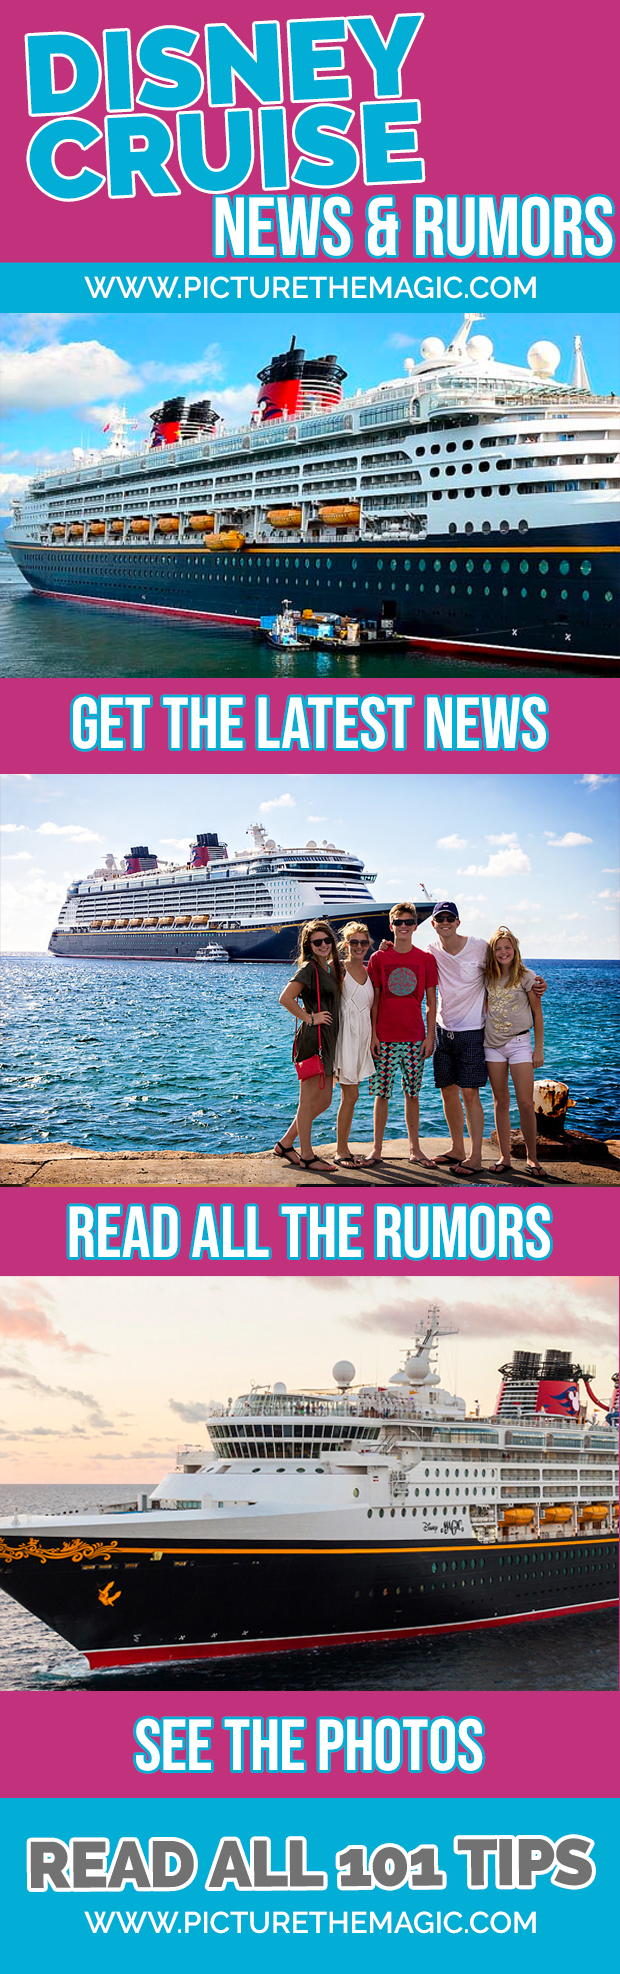 Disney Cruise News, Updates, and Rumors! #disneycruise #dcl #disneycruiseline